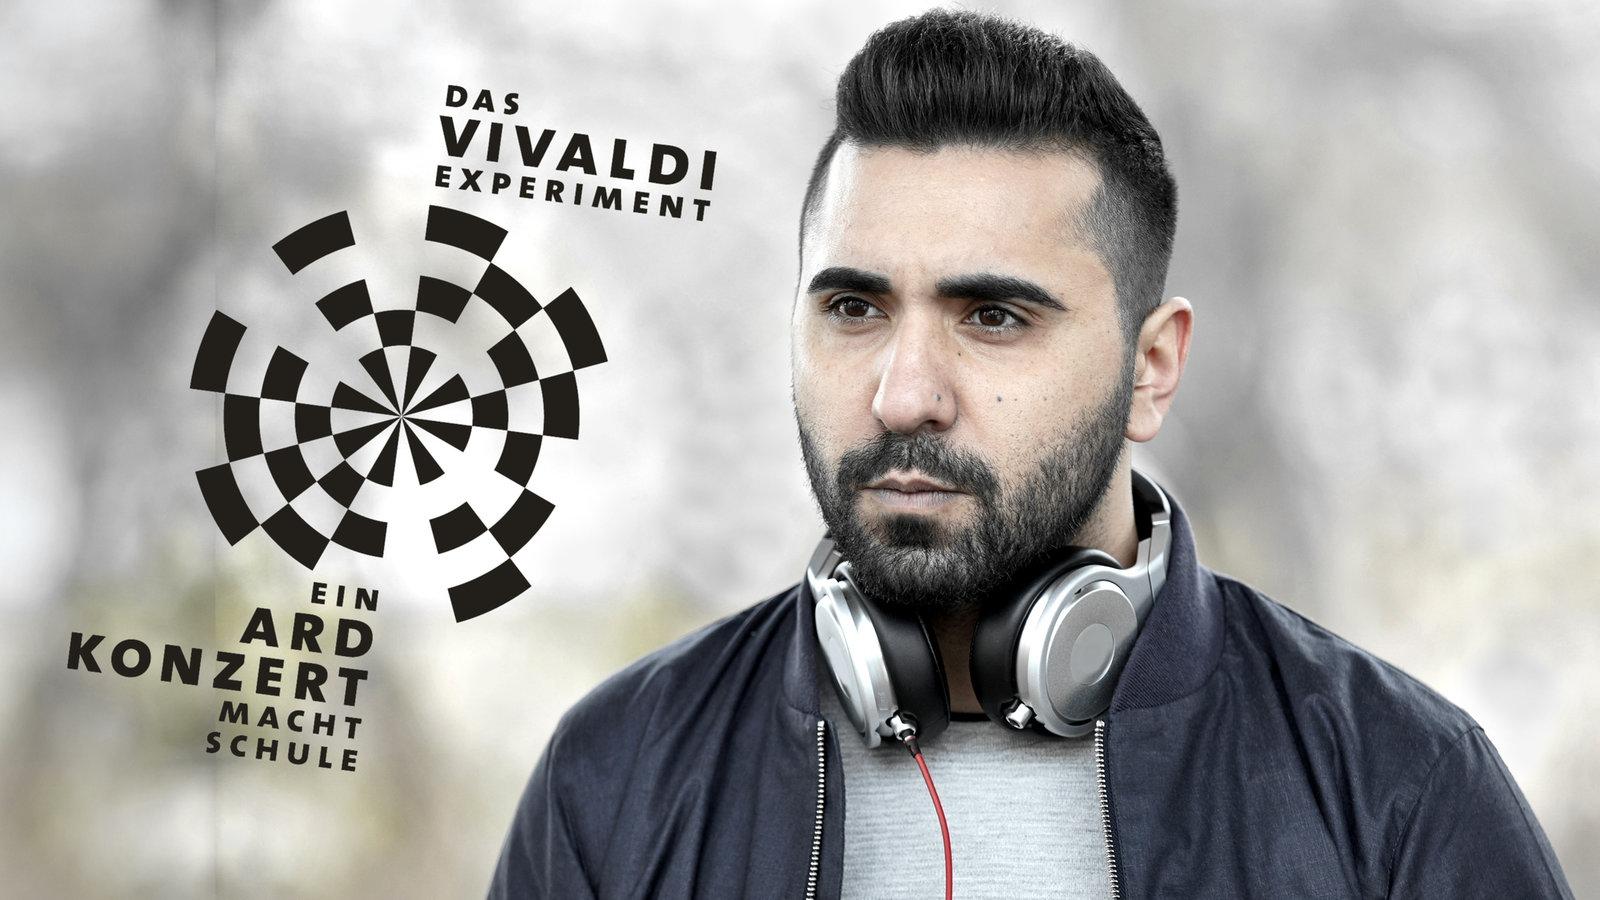 Vivaldi Experiment Wdr